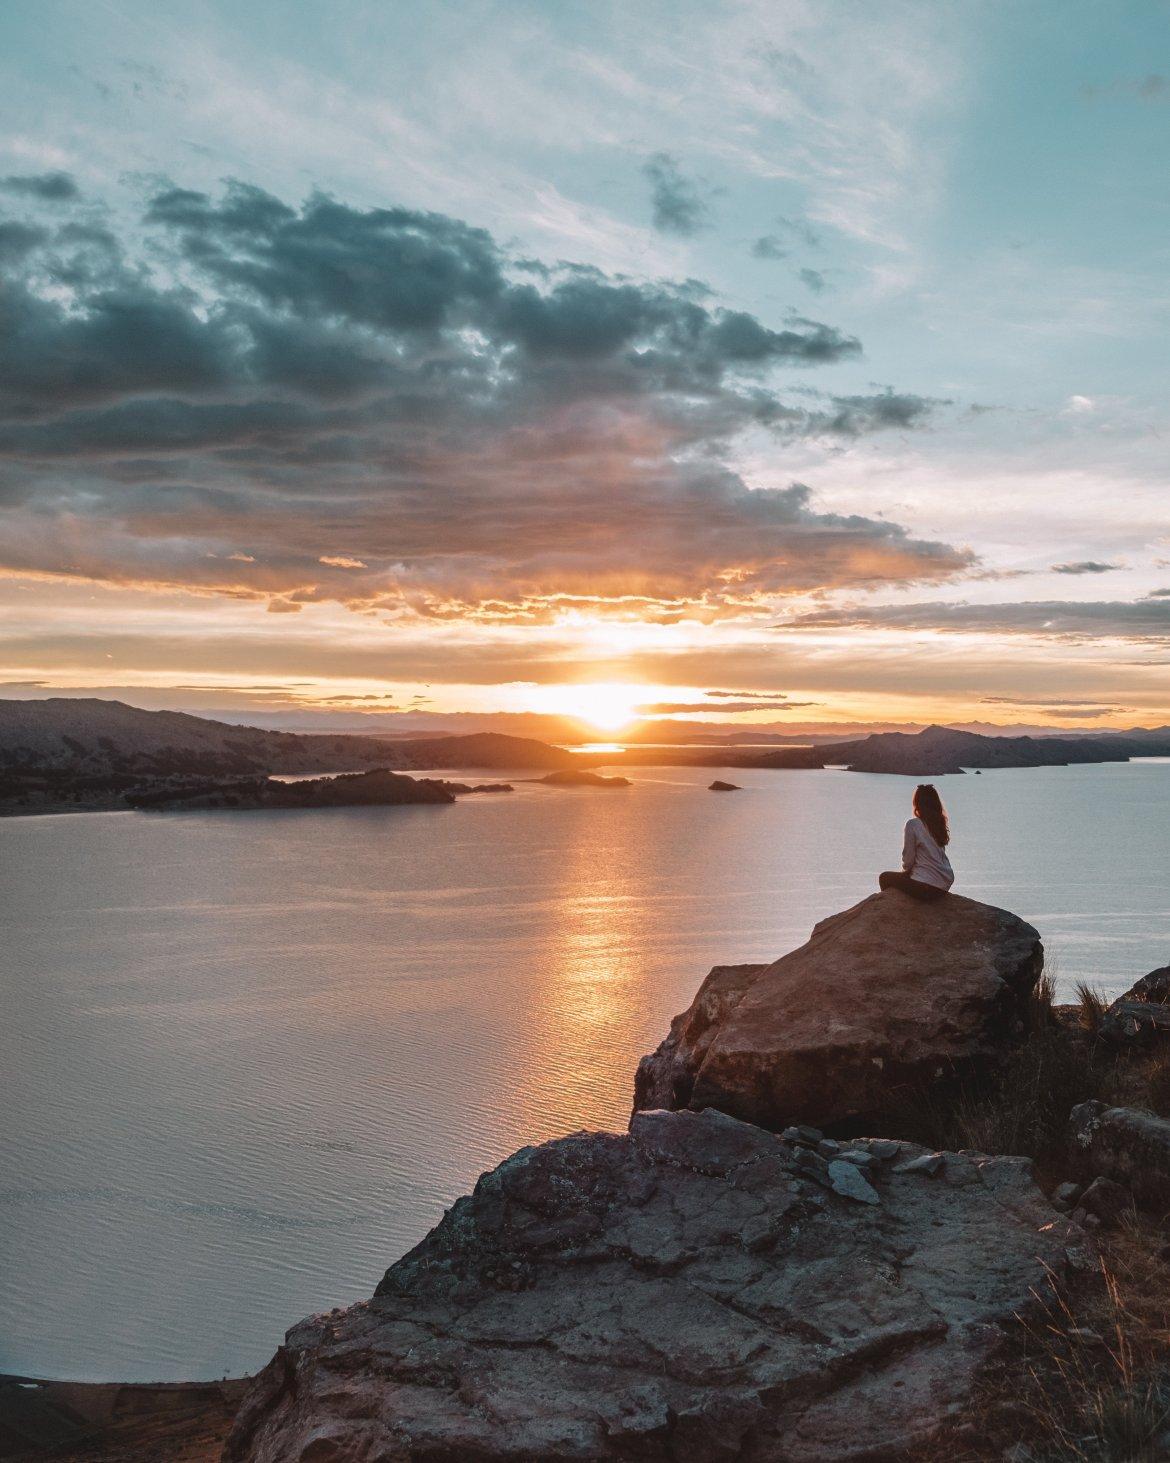 Titicaca sunset